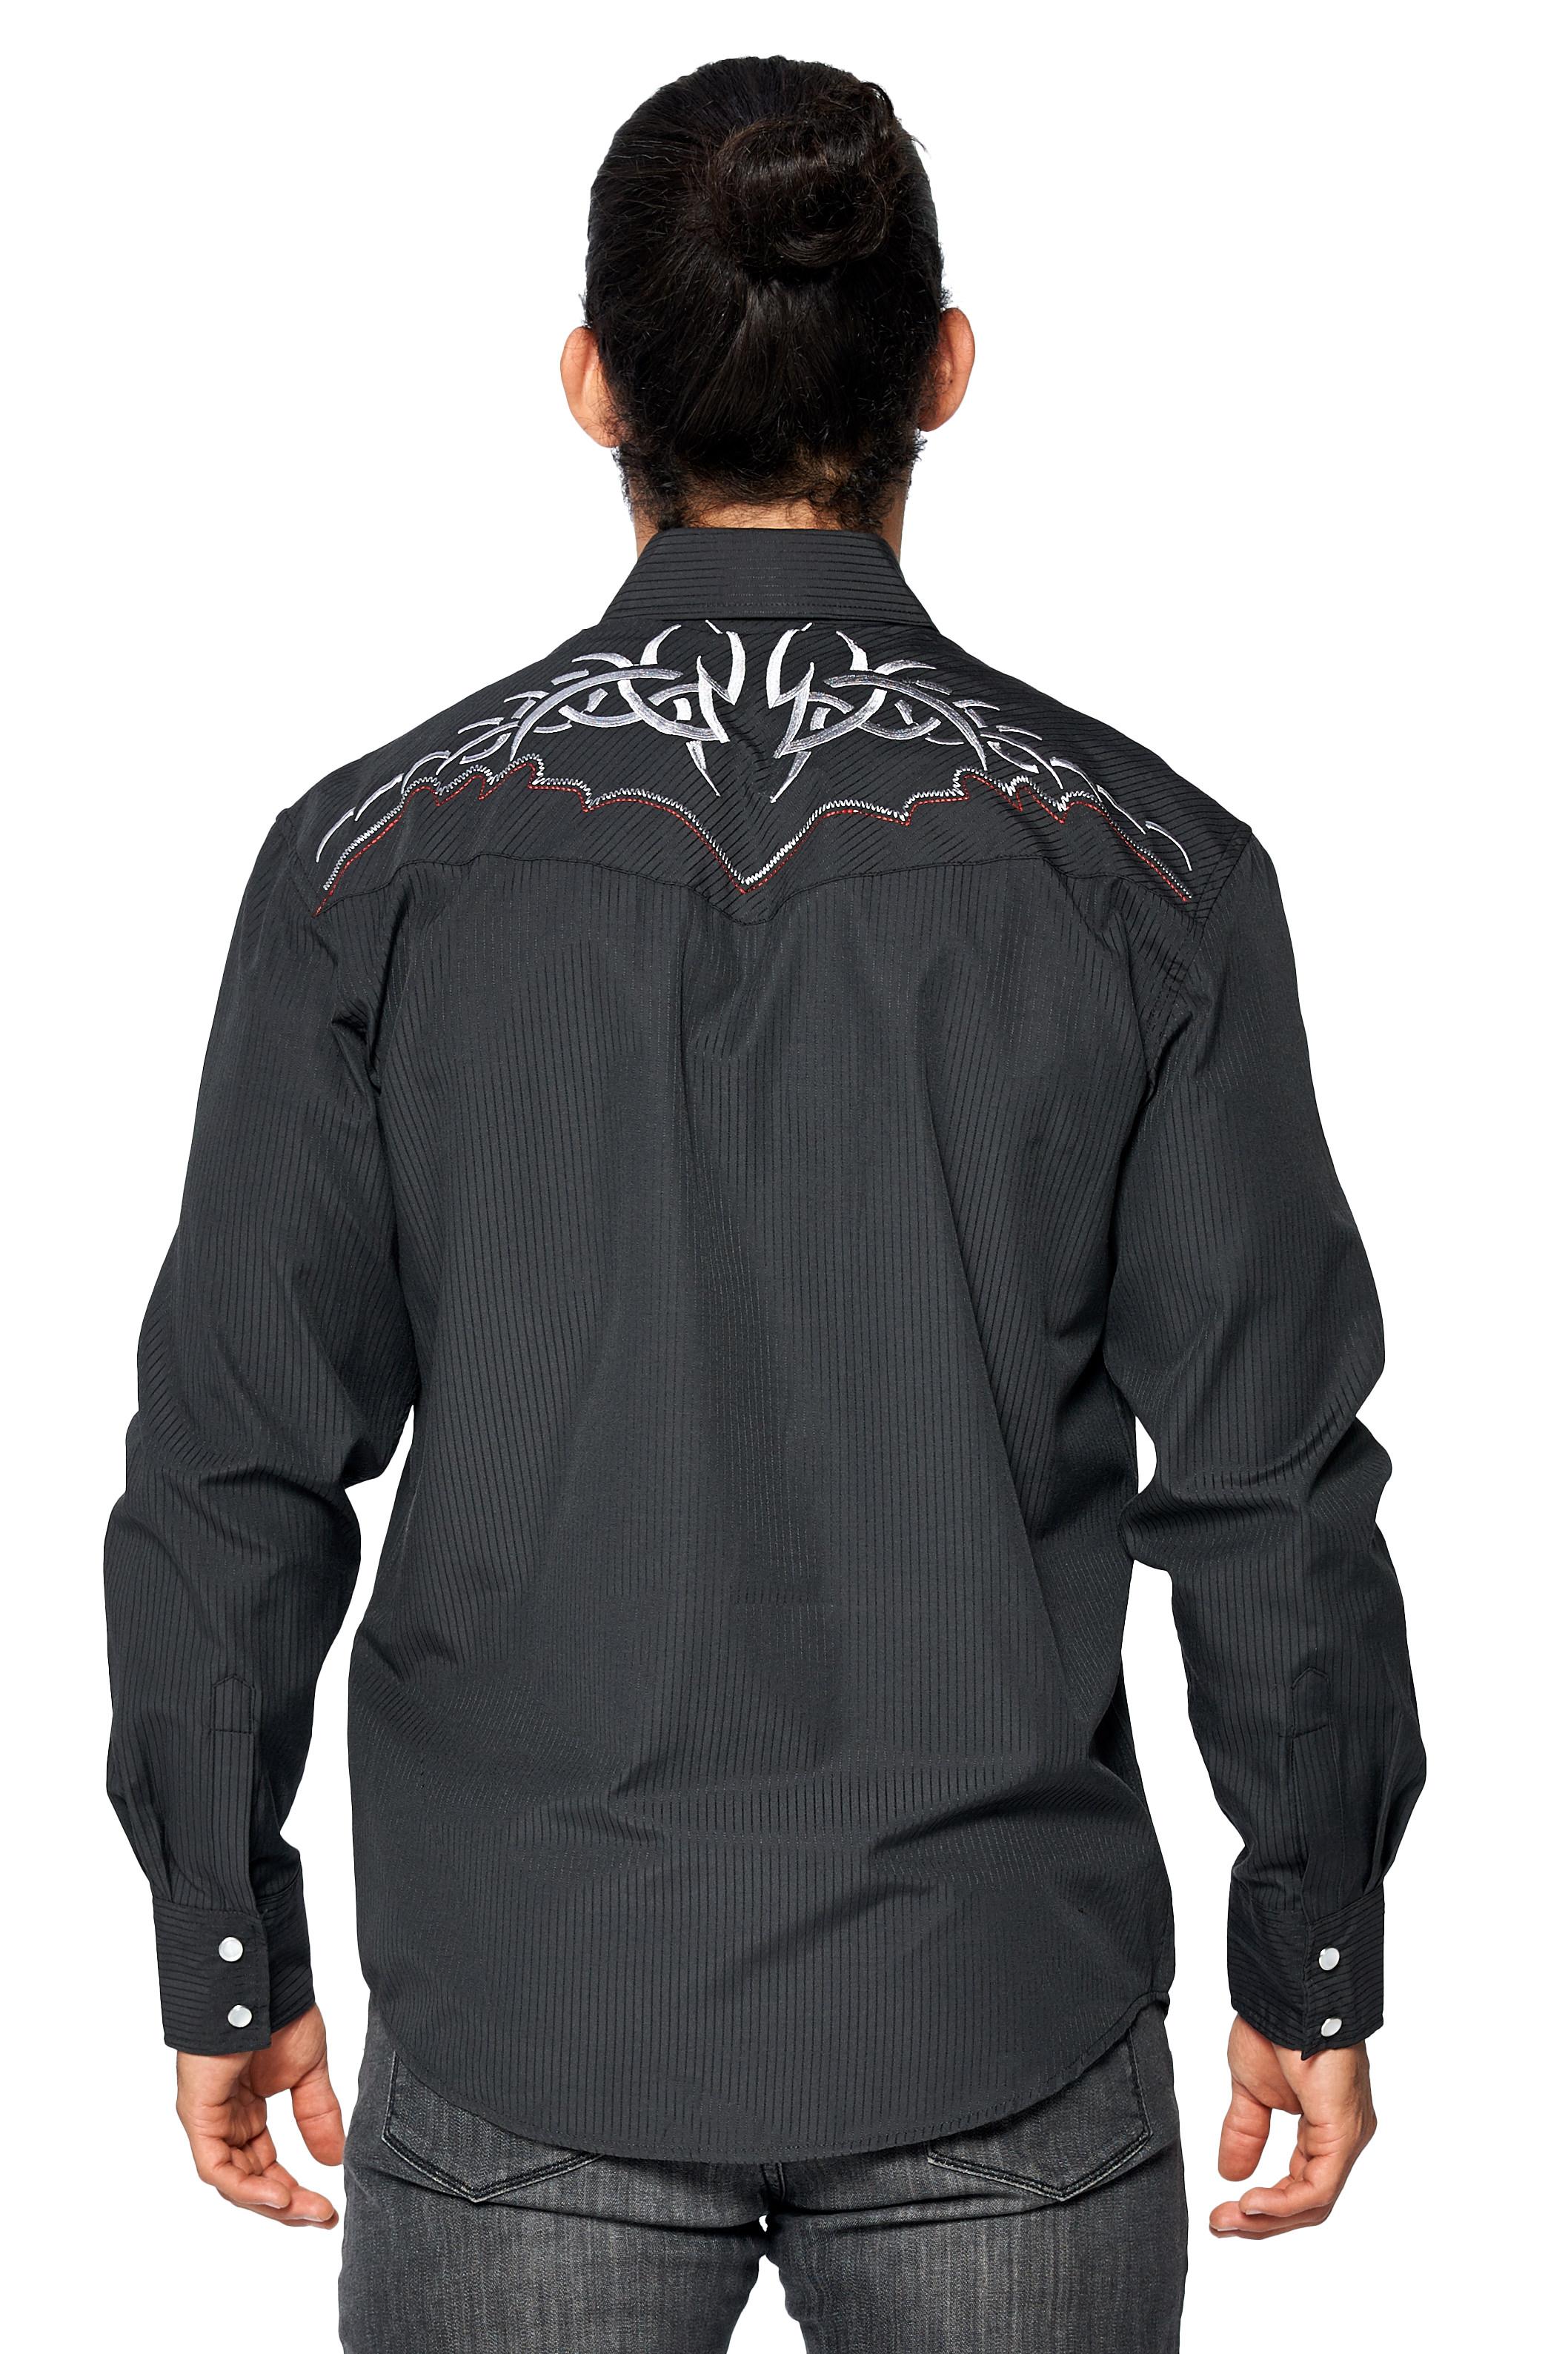 LW-Men-039-s-Pearl-Snap-Tribal-Stylish-Printed-Woven-Western-Vaquero-Rodeo-Shirt thumbnail 55